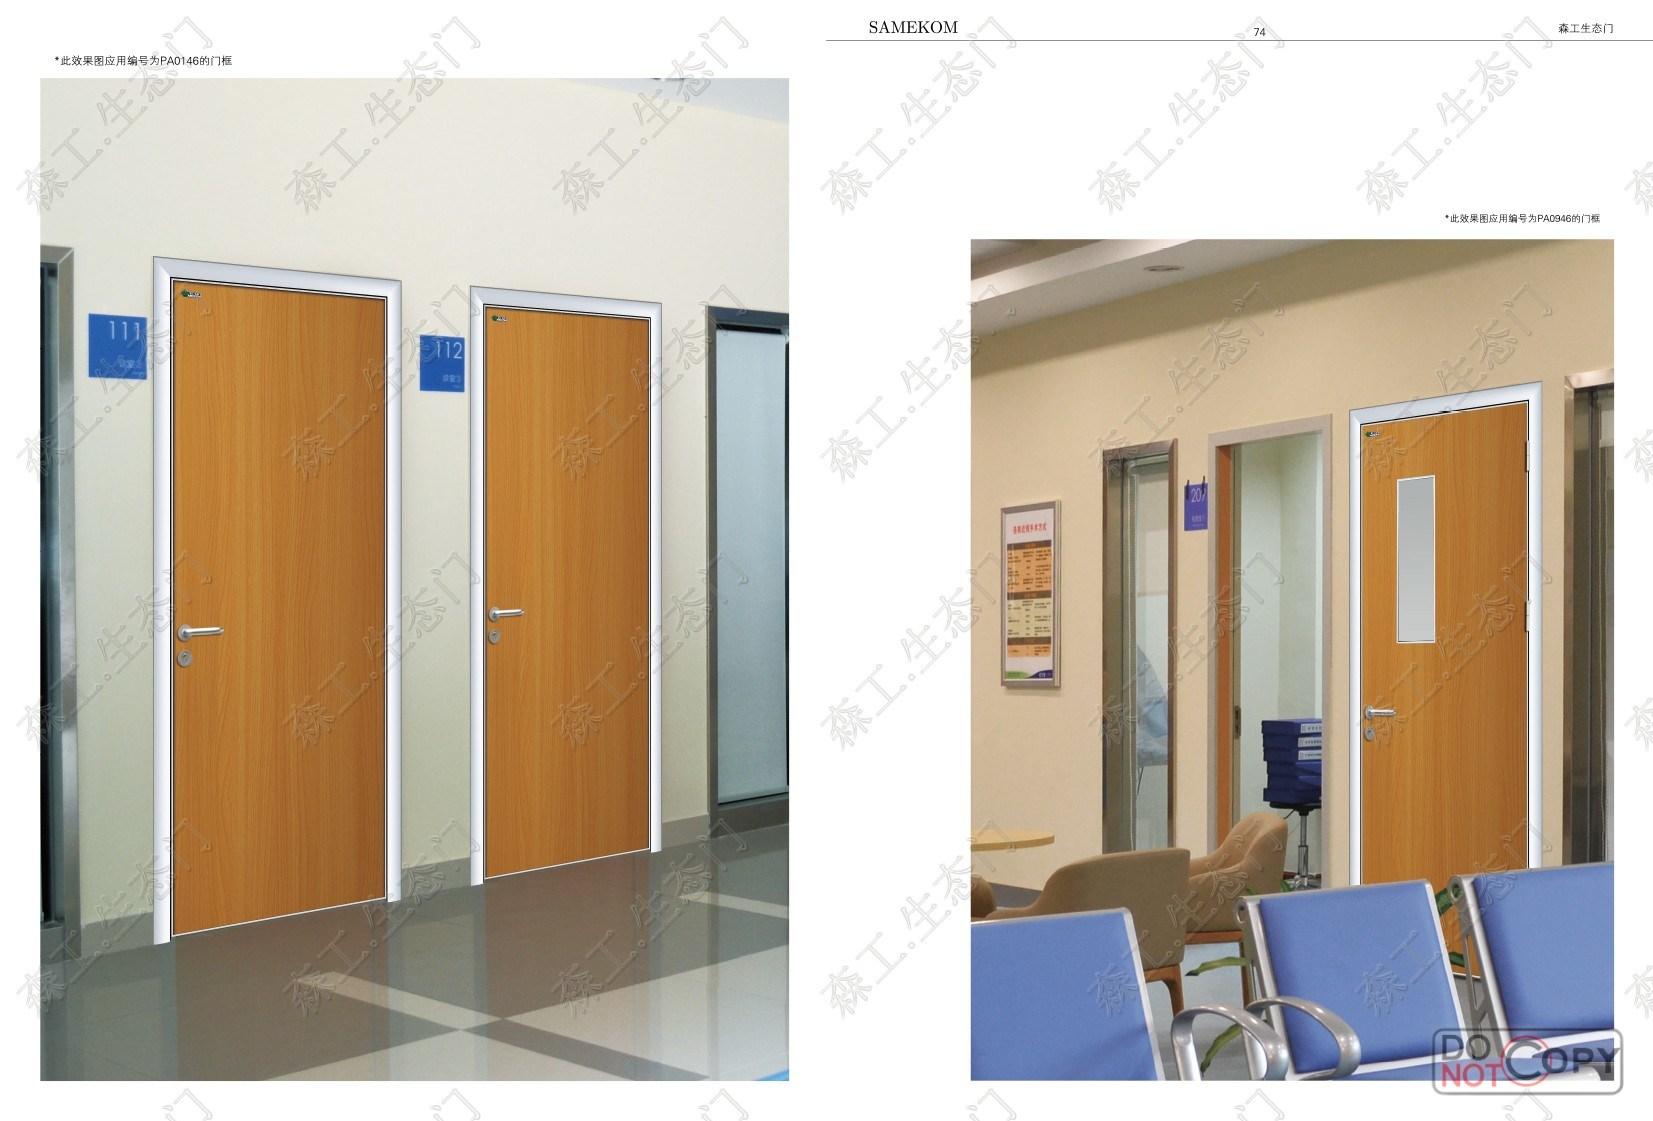 Hospital Patient Room Doors   www.imgkid.com - The Image ...